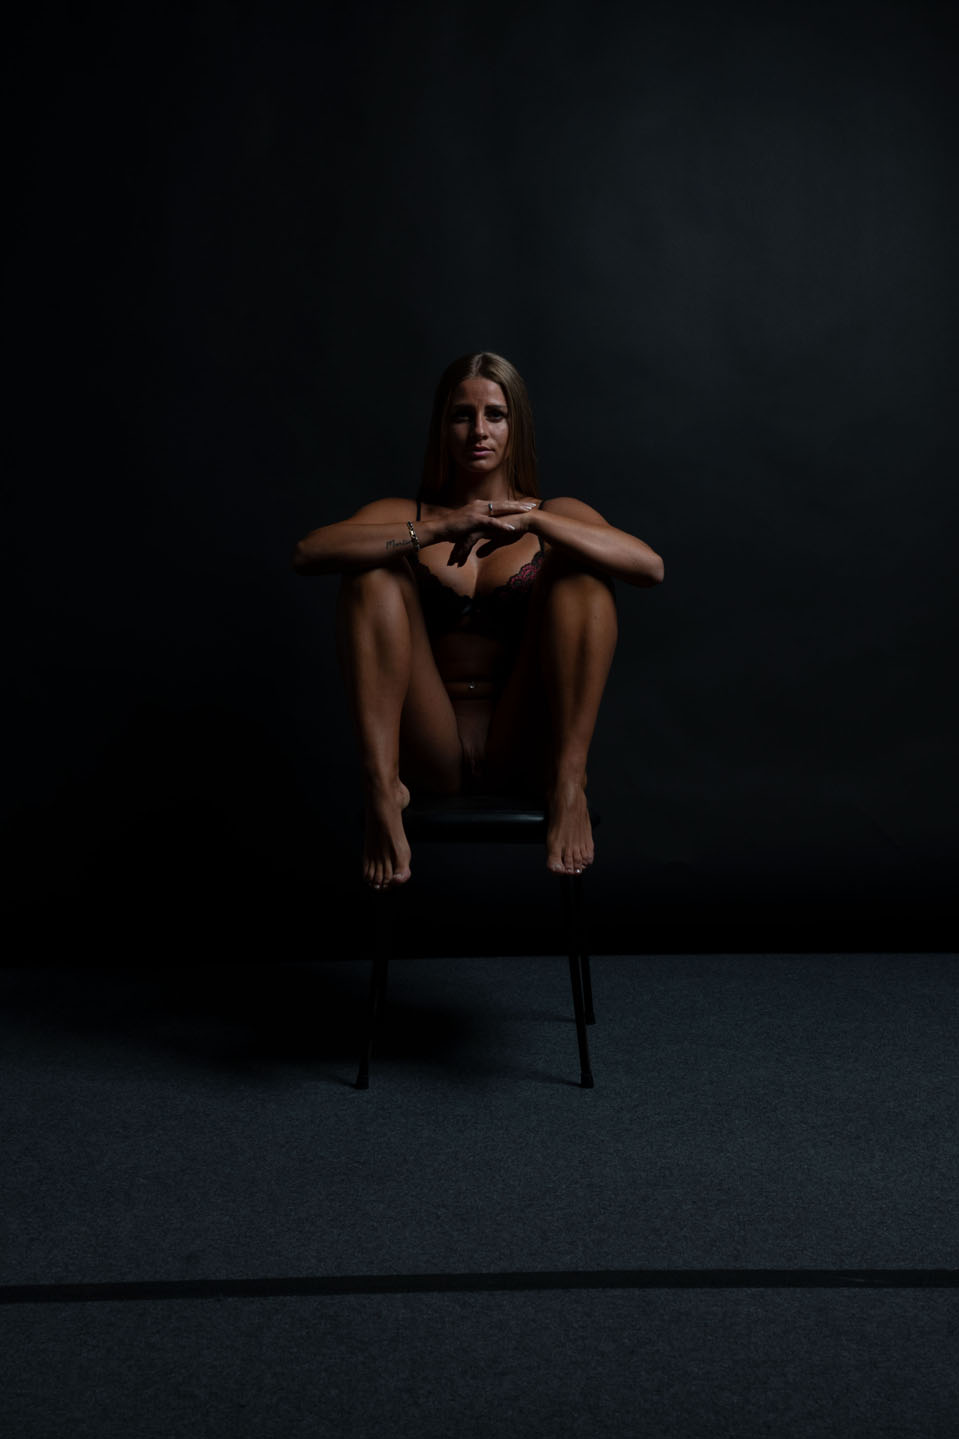 Valentina_Zamperoni_098